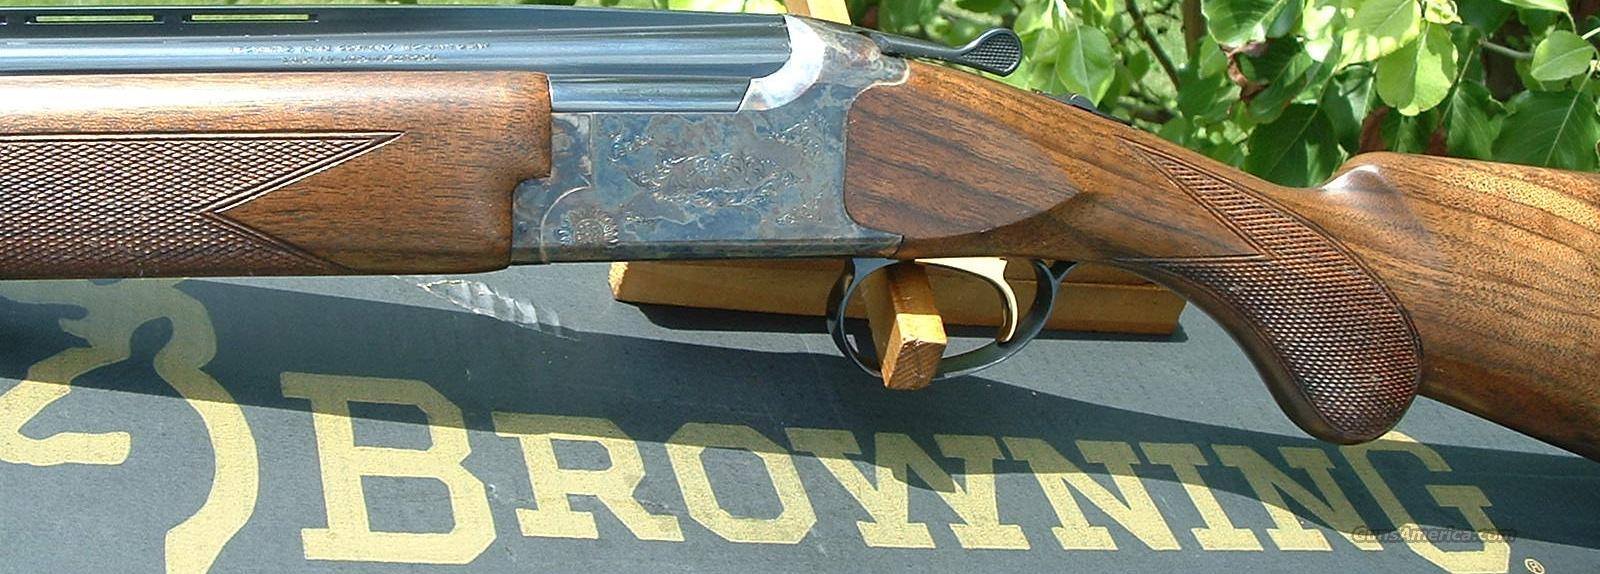 Ltd Edition Citori Lightning Case Color 20 ga.  New!  Guns > Shotguns > Browning Shotguns > Over Unders > Citori > Hunting